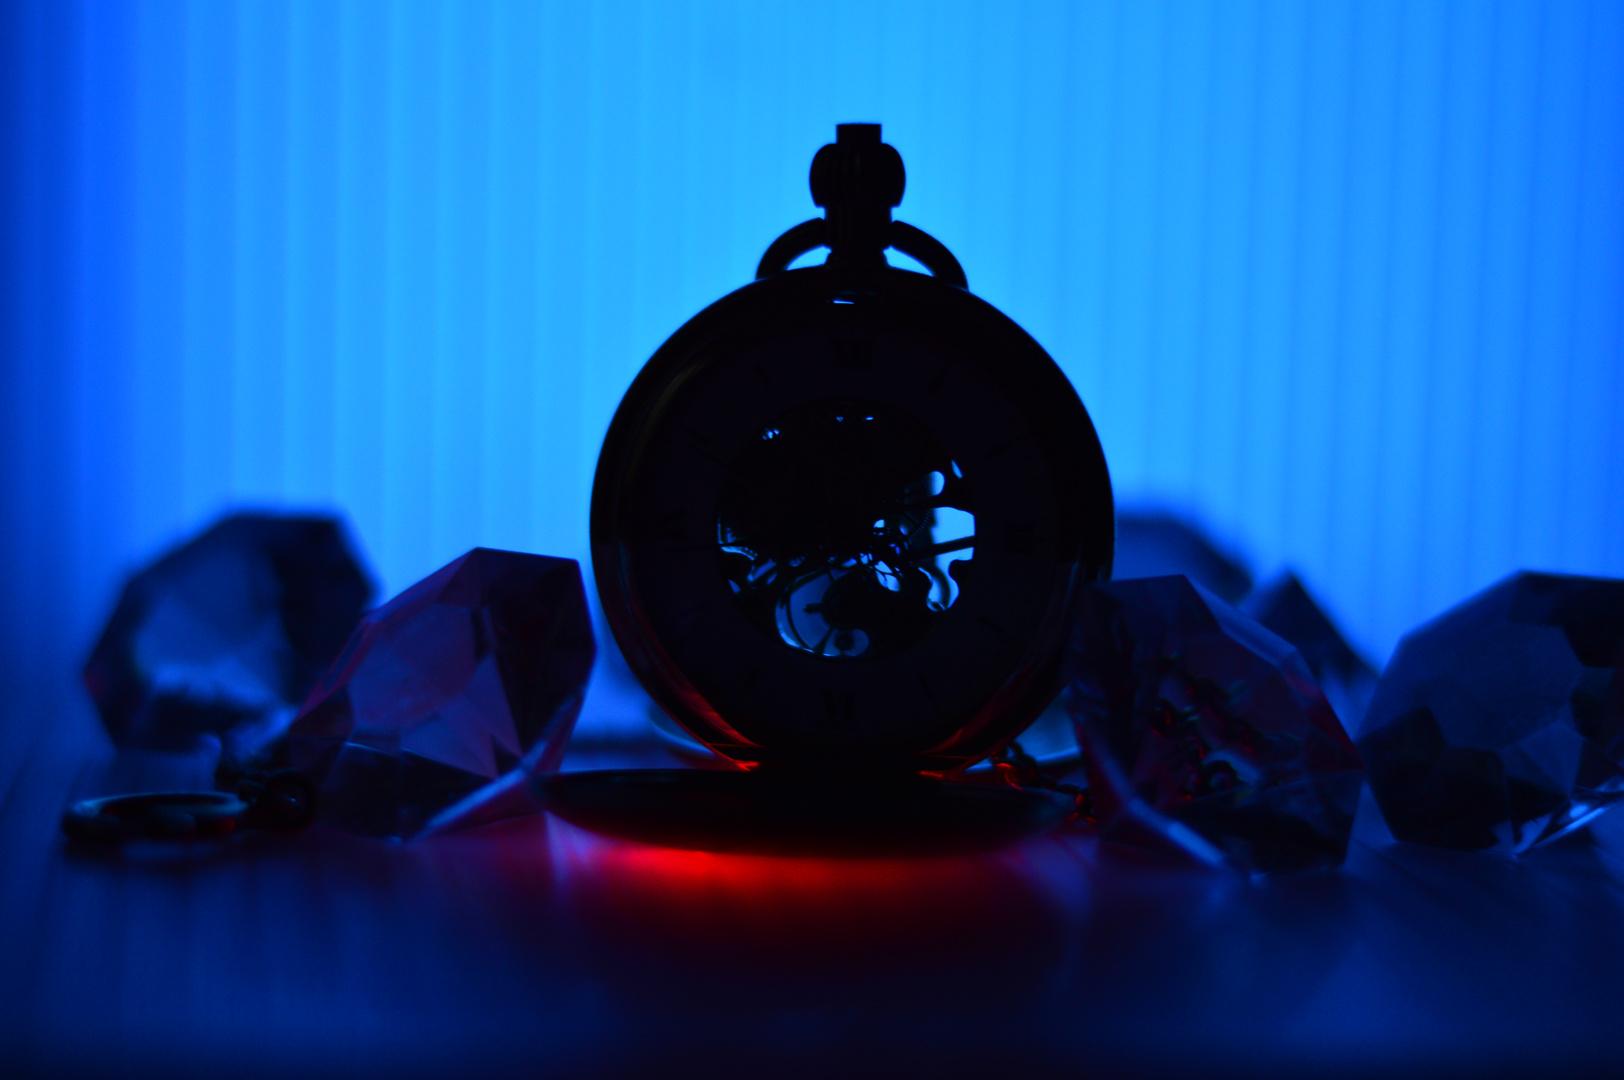 Zeit ist wertvoller als Diamanten